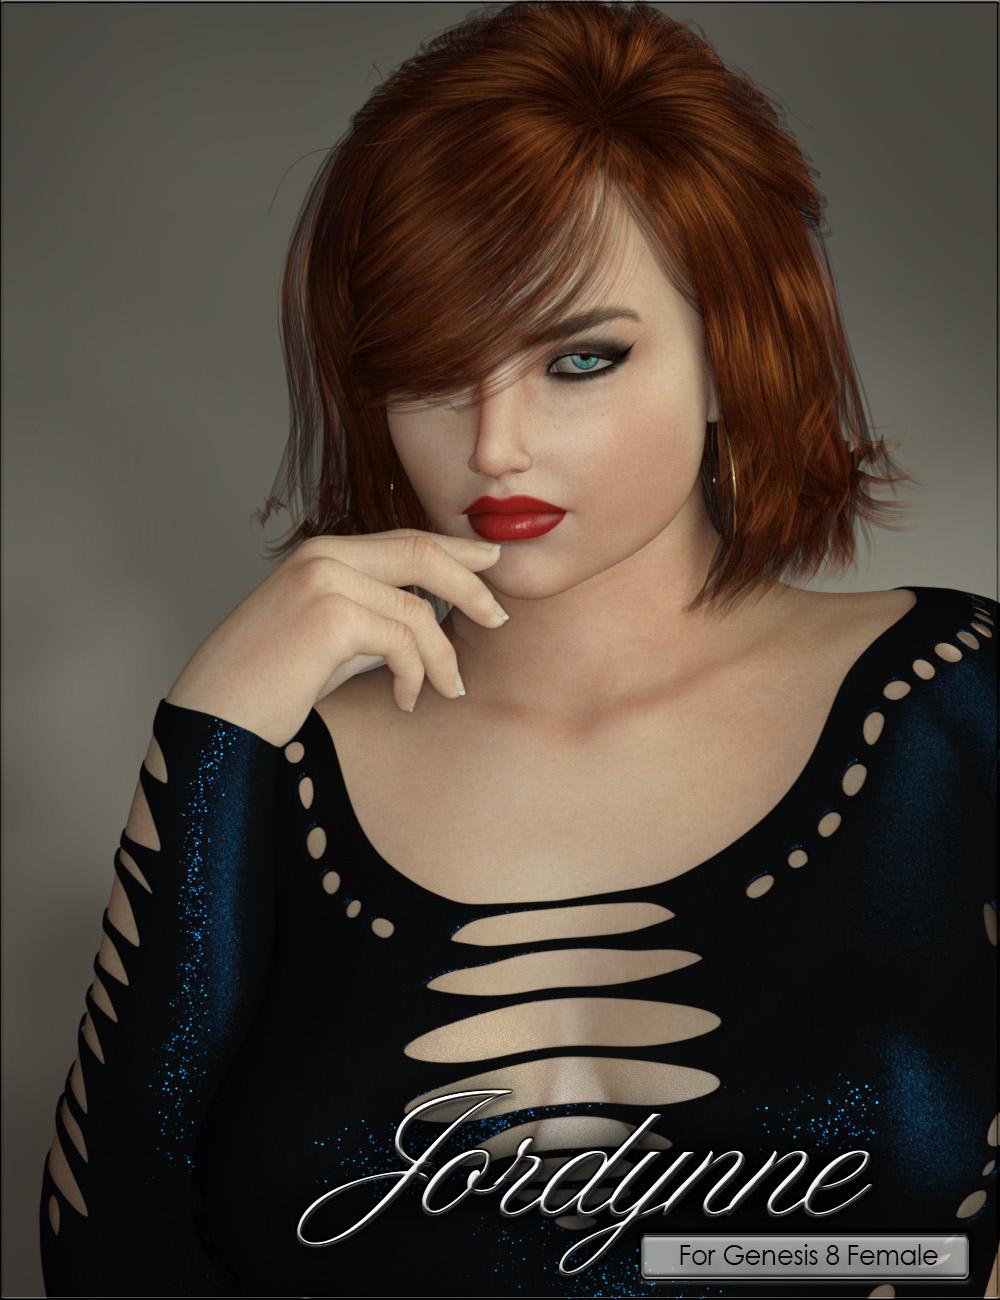 VYK Jordynne for Genesis 8 Female by: vyktohria, 3D Models by Daz 3D